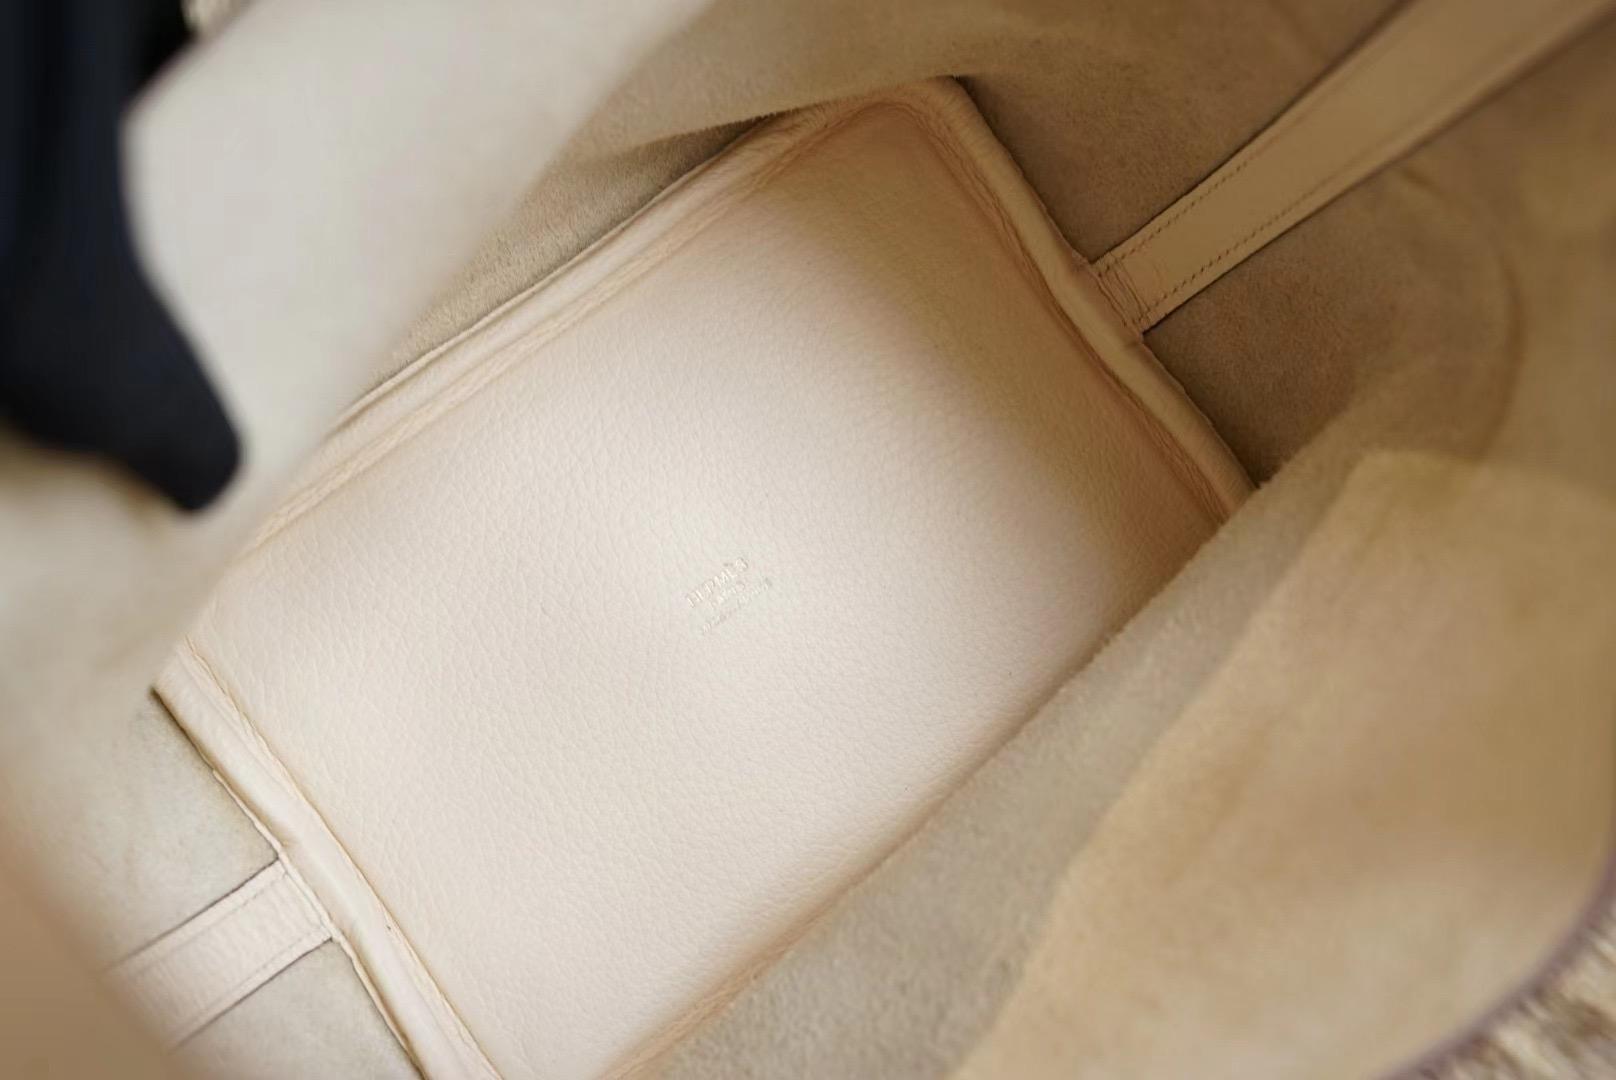 Hermes Picotin 18CM Nata奶油白 菜蓝子18 原厂 Clemence皮 法国蜡线 全手缝